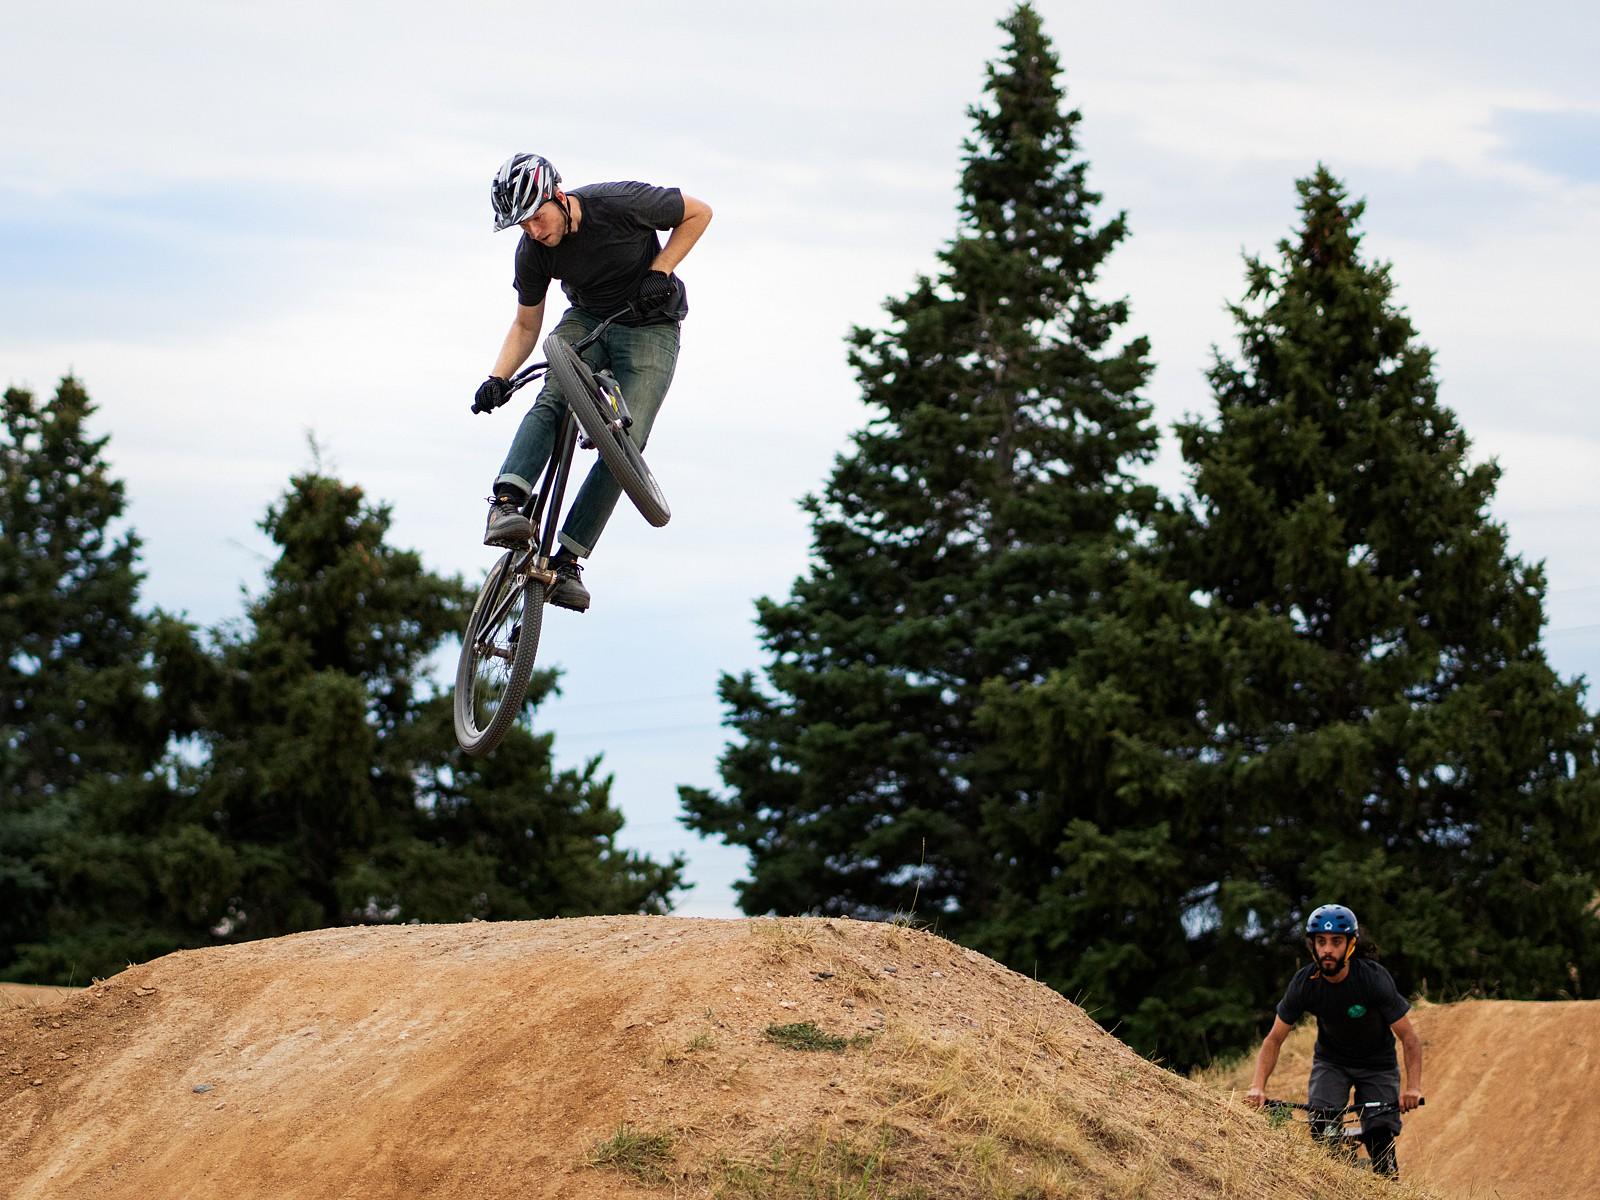 party train! - ur_pal_al - Mountain Biking Pictures - Vital MTB